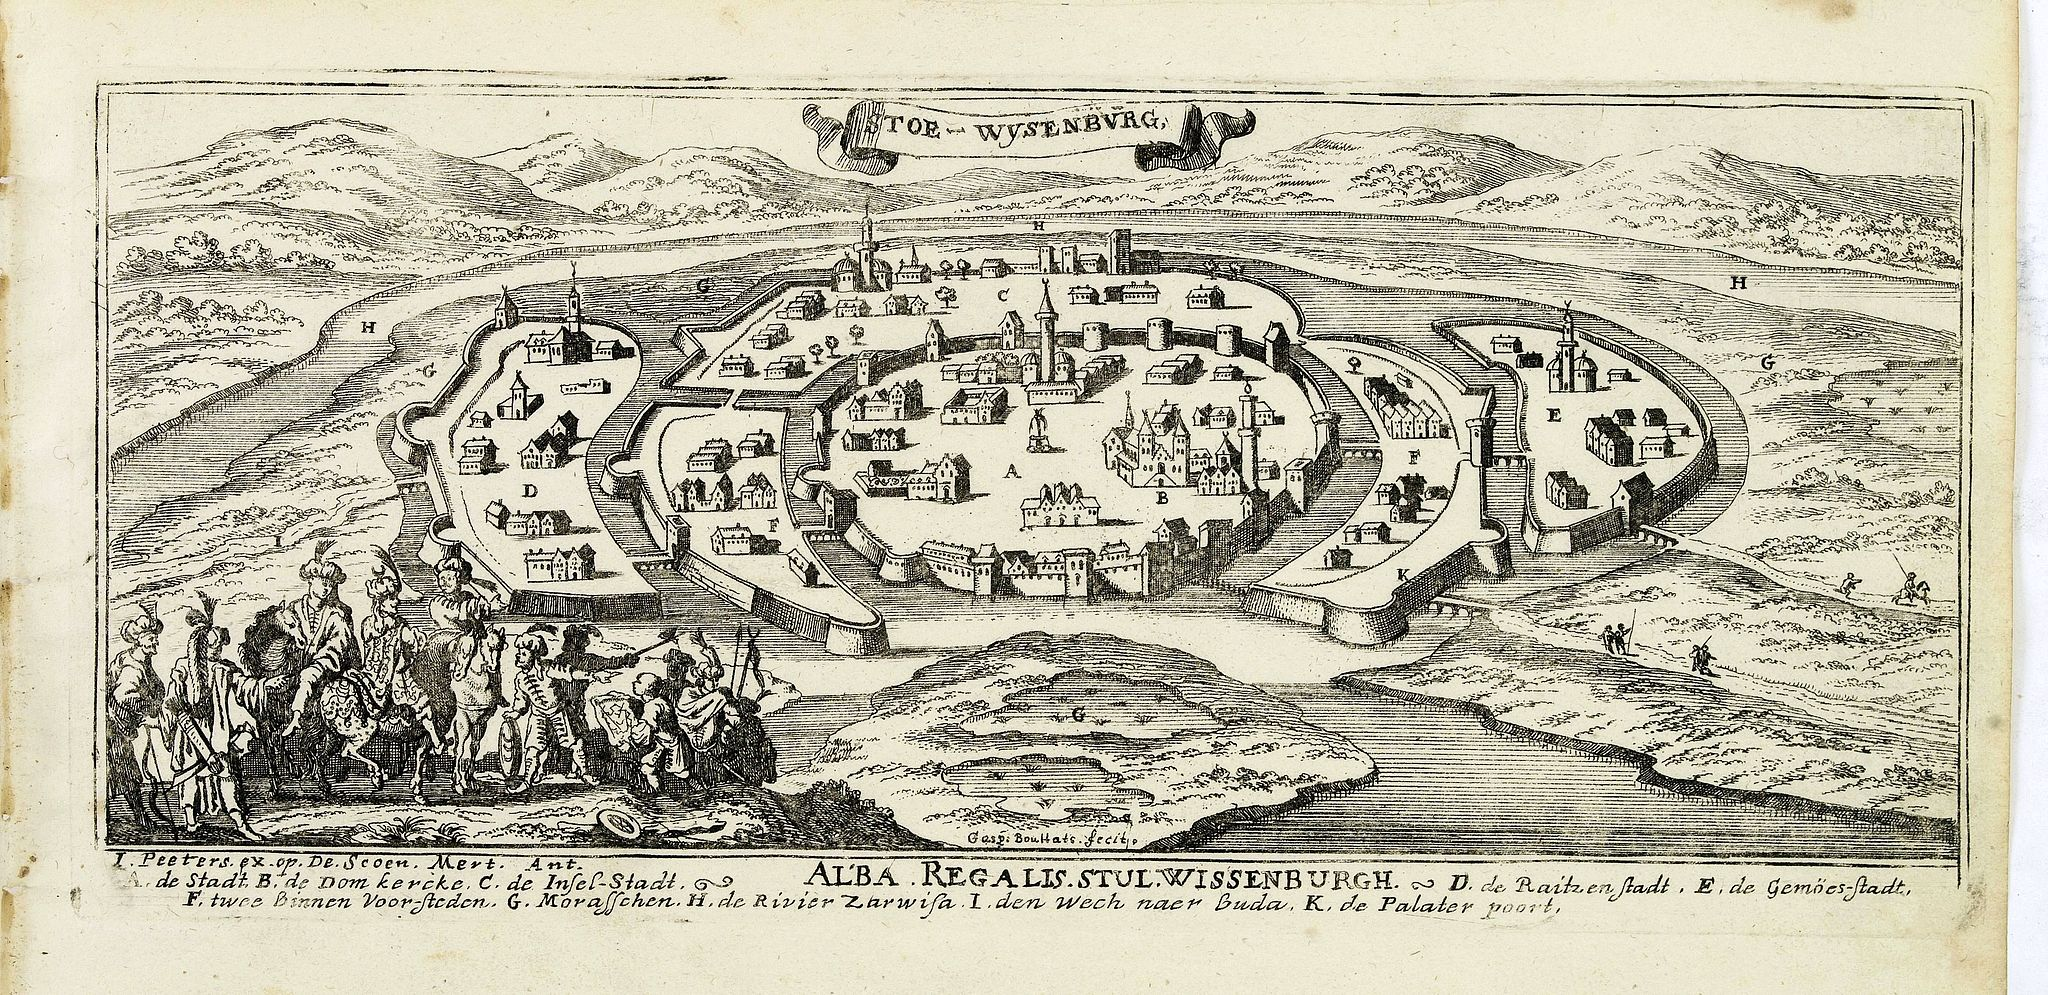 PEETERS, J. / BOUTTATS, G. -  Stoe-Wysenburg.